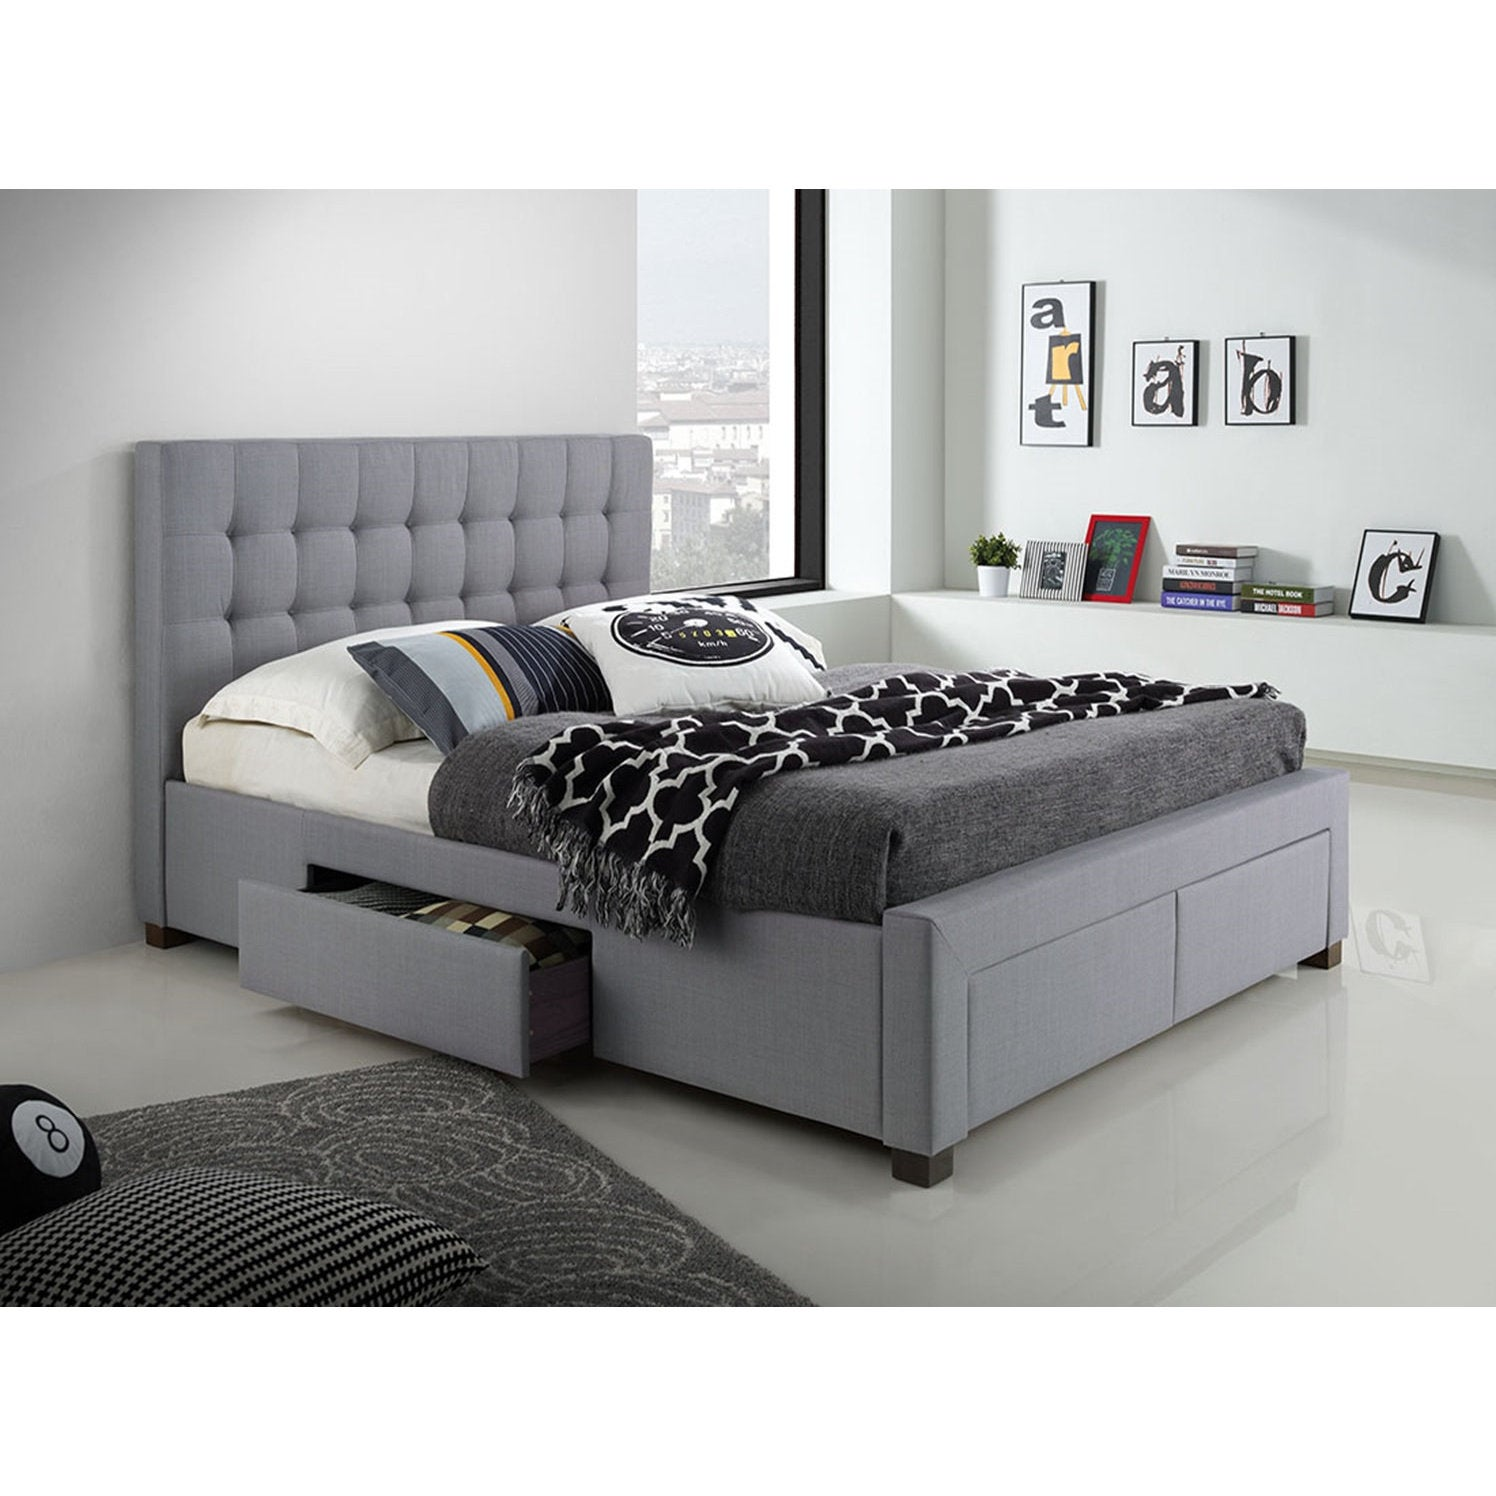 Dg Casa Kyla Grey Wood Fabric 4 Drawer Platform Storage Bed Overstock 14308424 Queen Linen Fabric Storage Upholstered